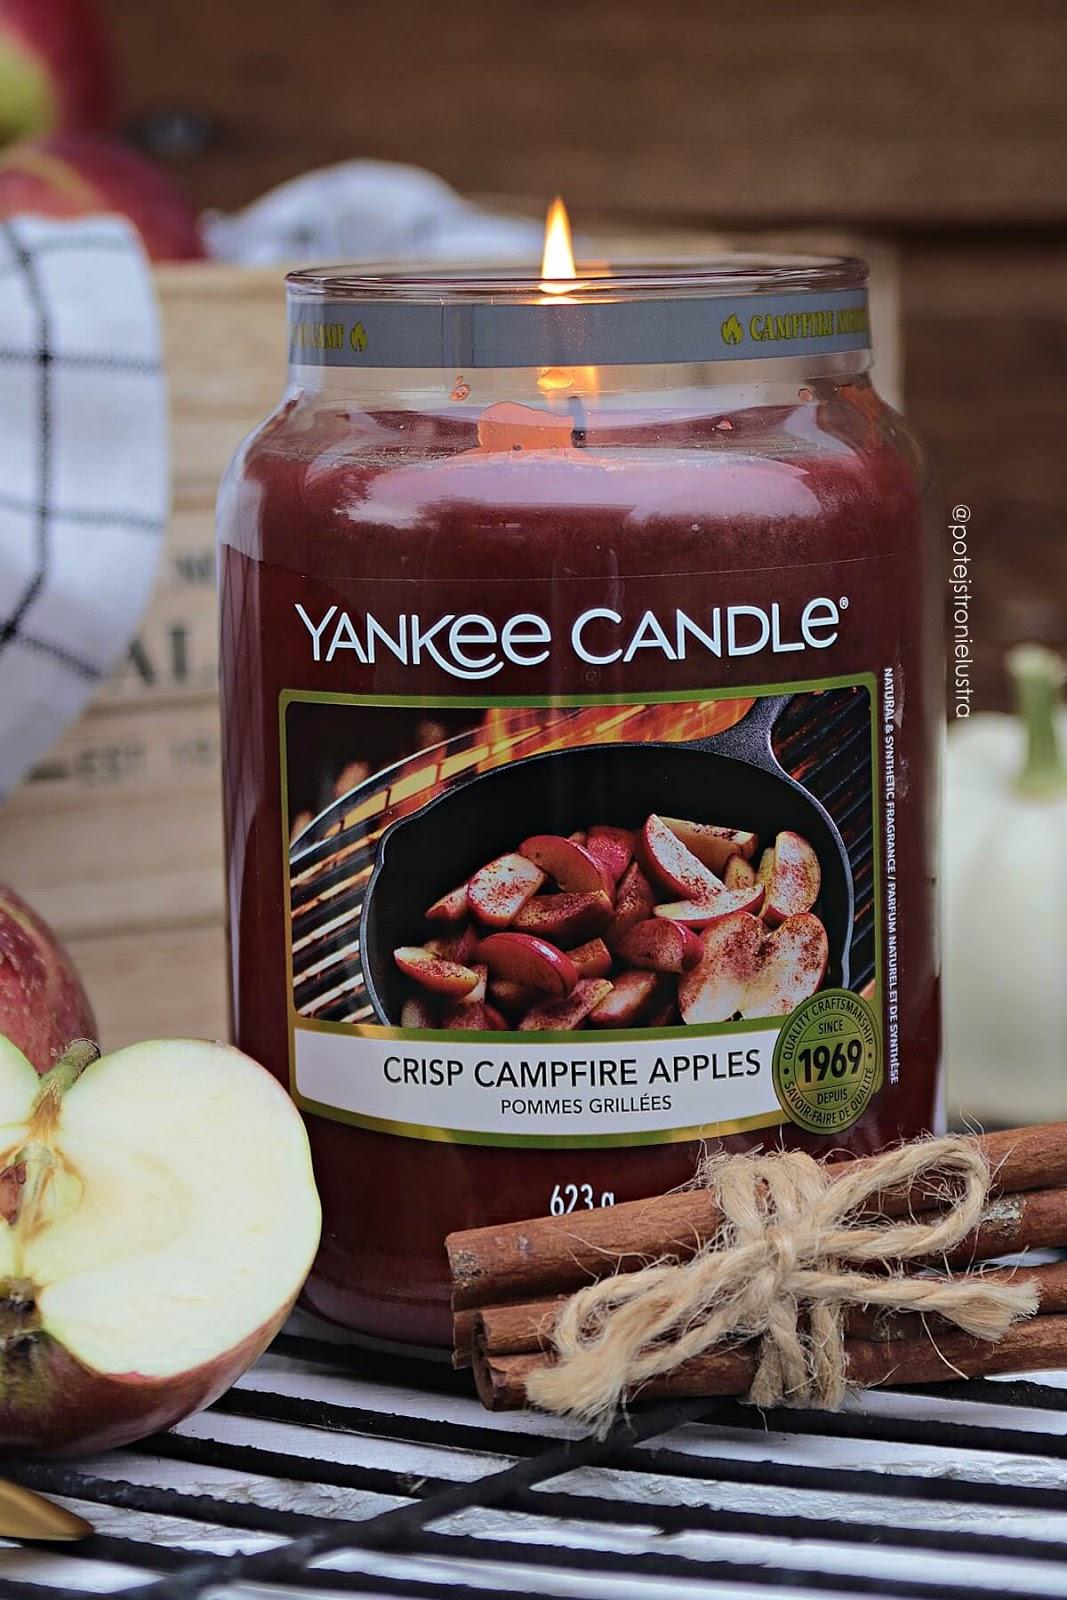 yankee candle crisp campfire apples q3 2020 świeca o zapachu jabłek z cynamonem, szarlotki